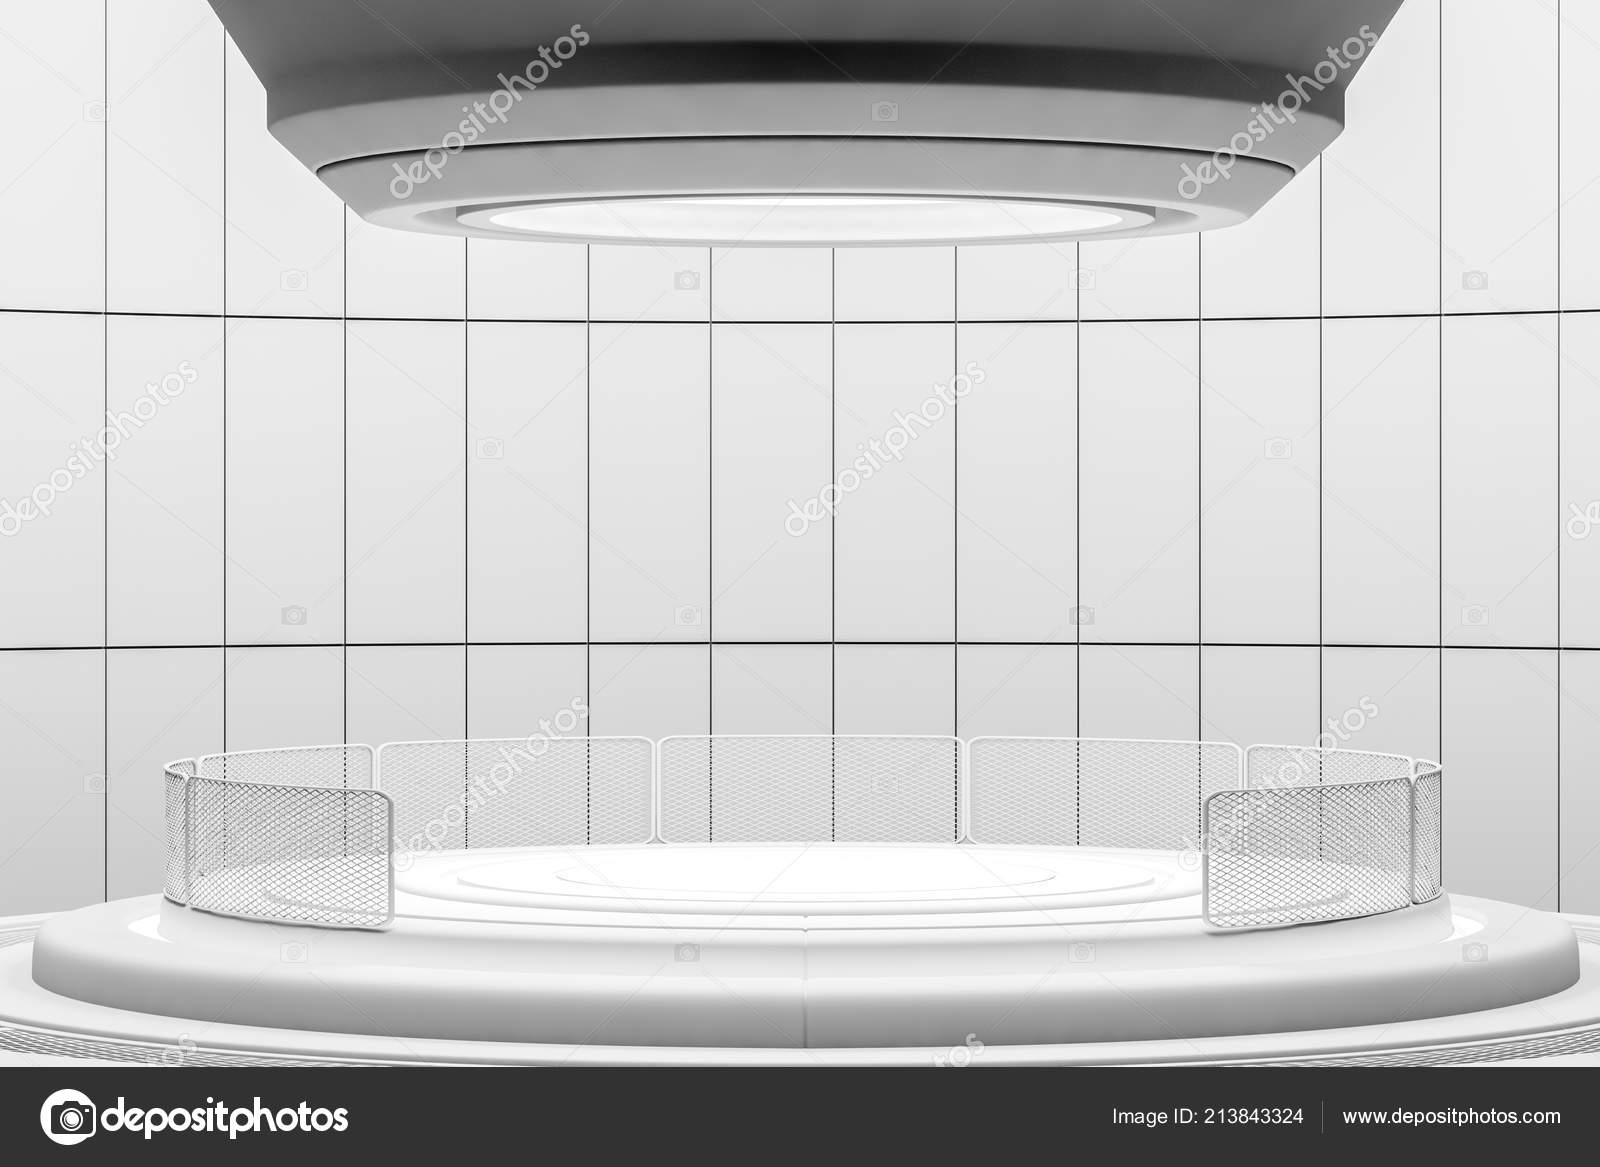 Holographic Chamber Teleportation Room Terraforming